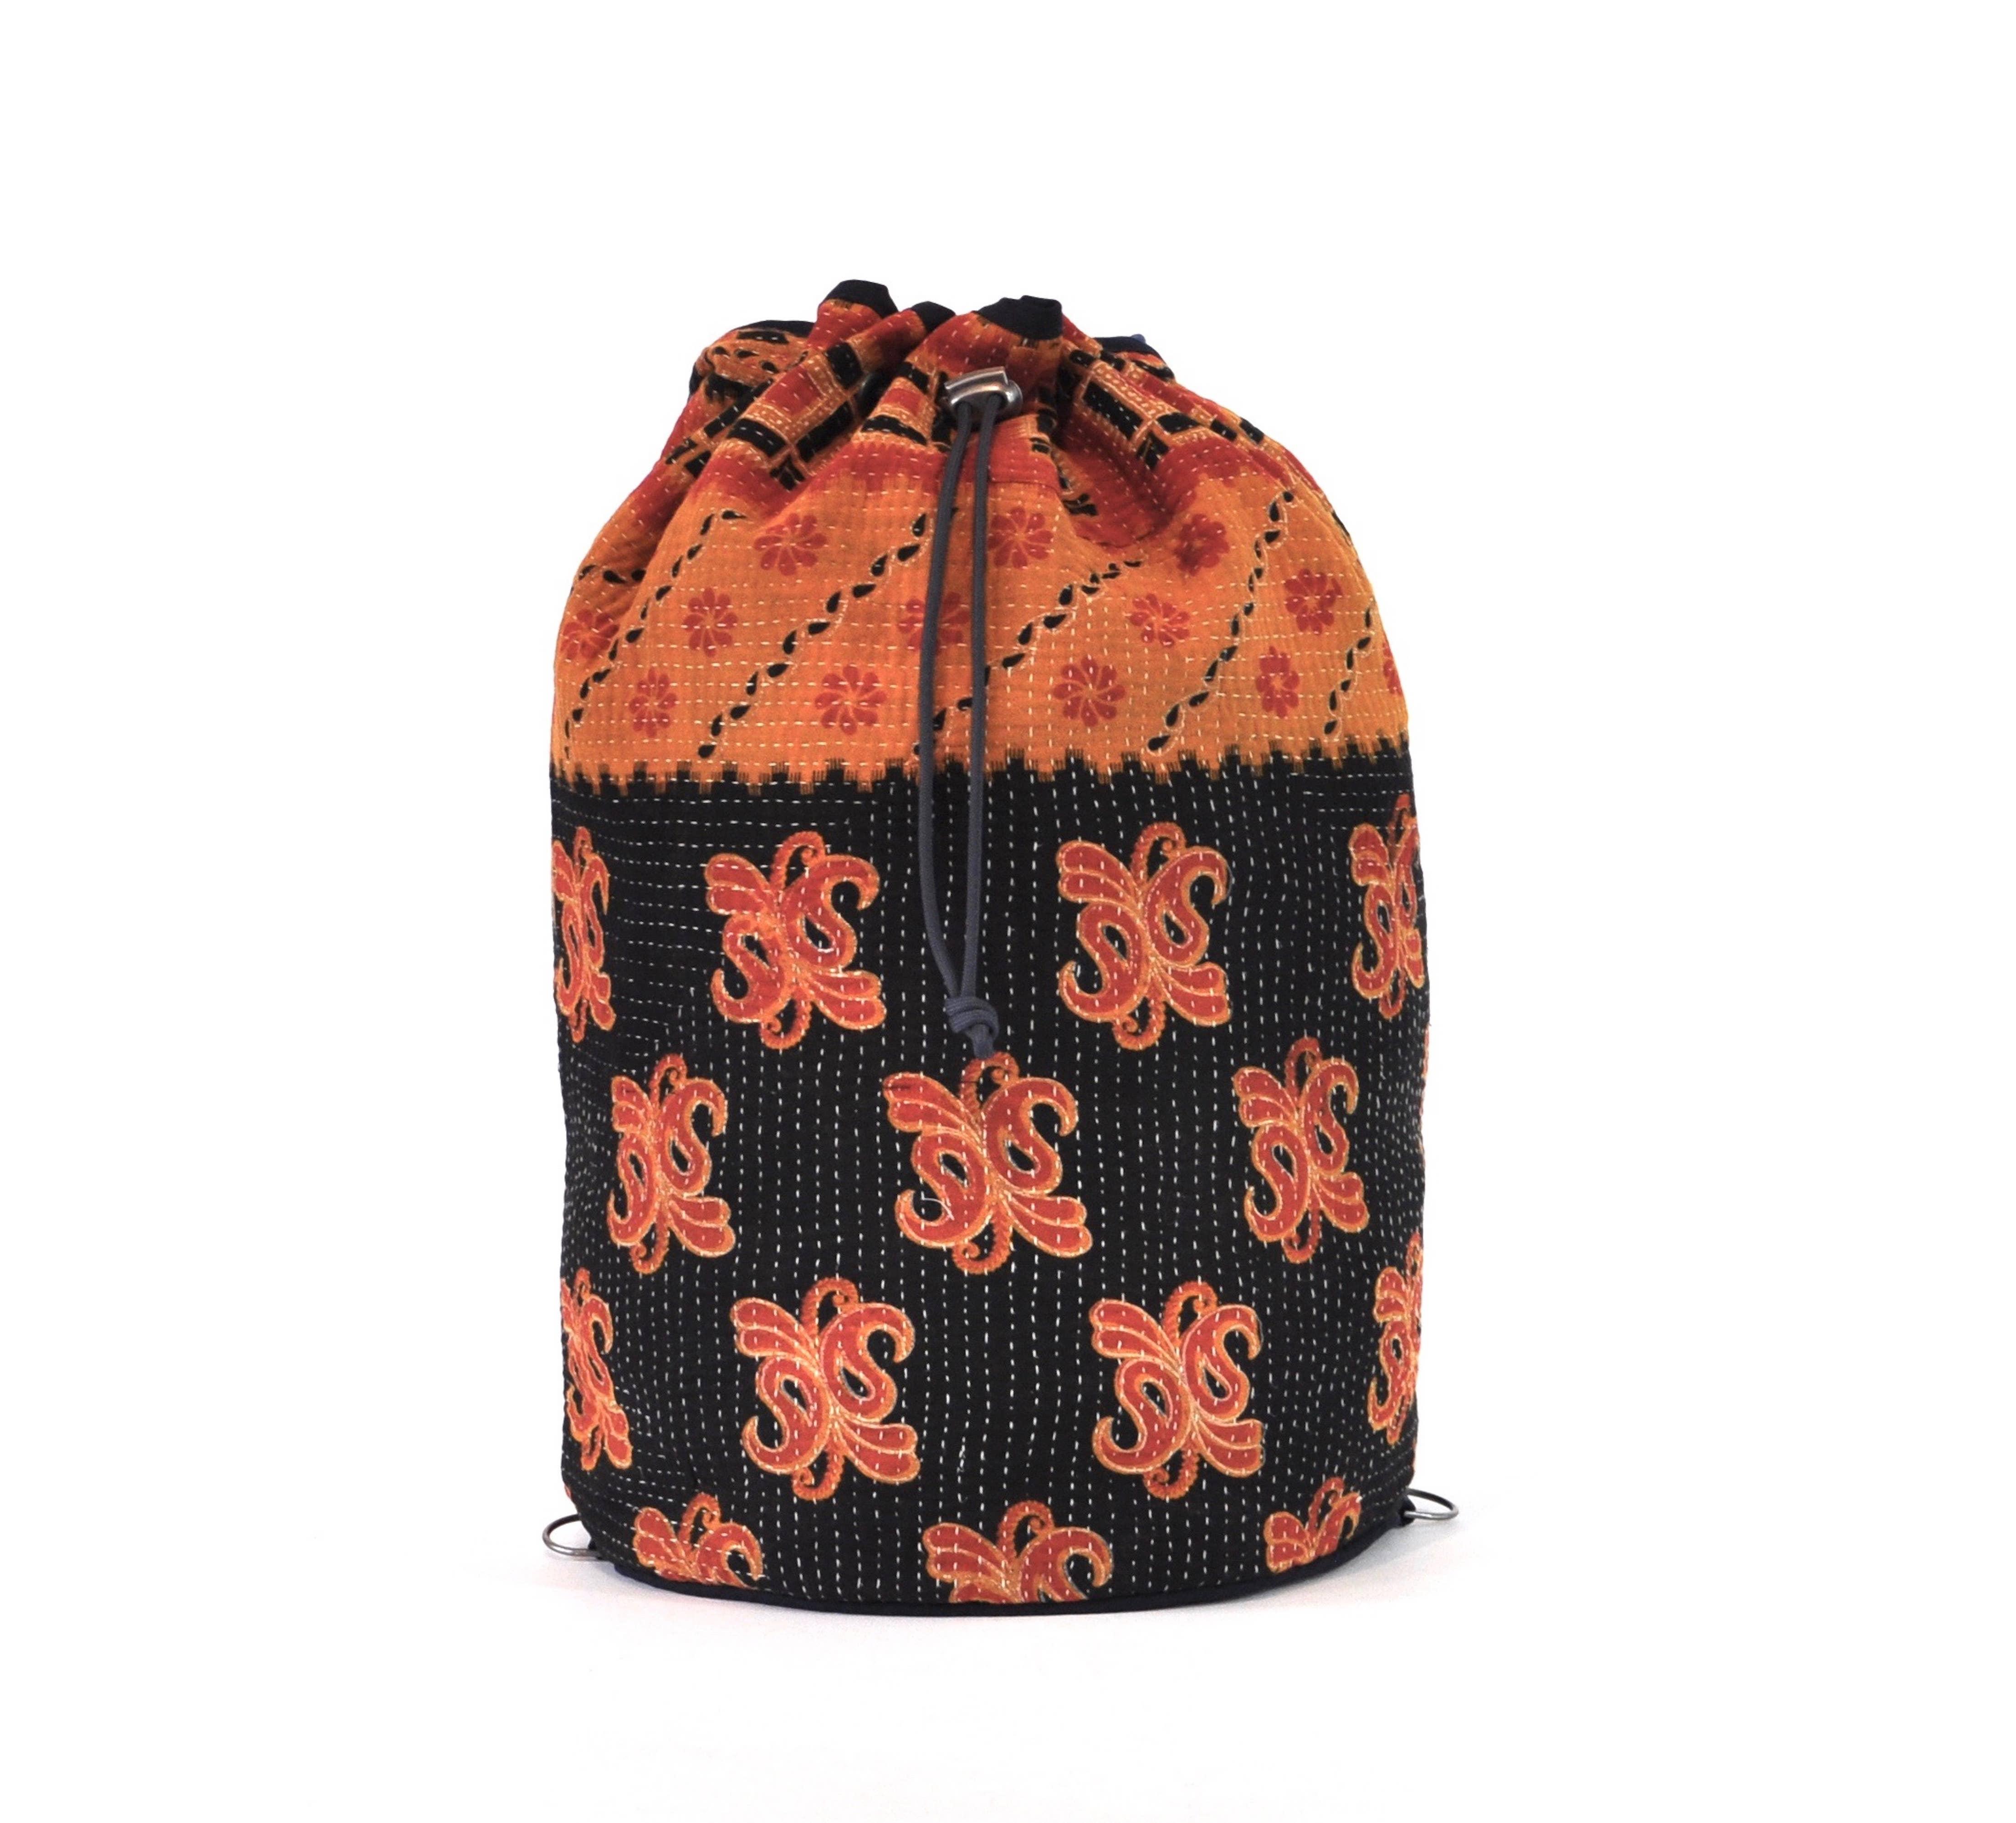 Yoga BagCrossbody Duffel Red Saffron /& Black Multi Motif